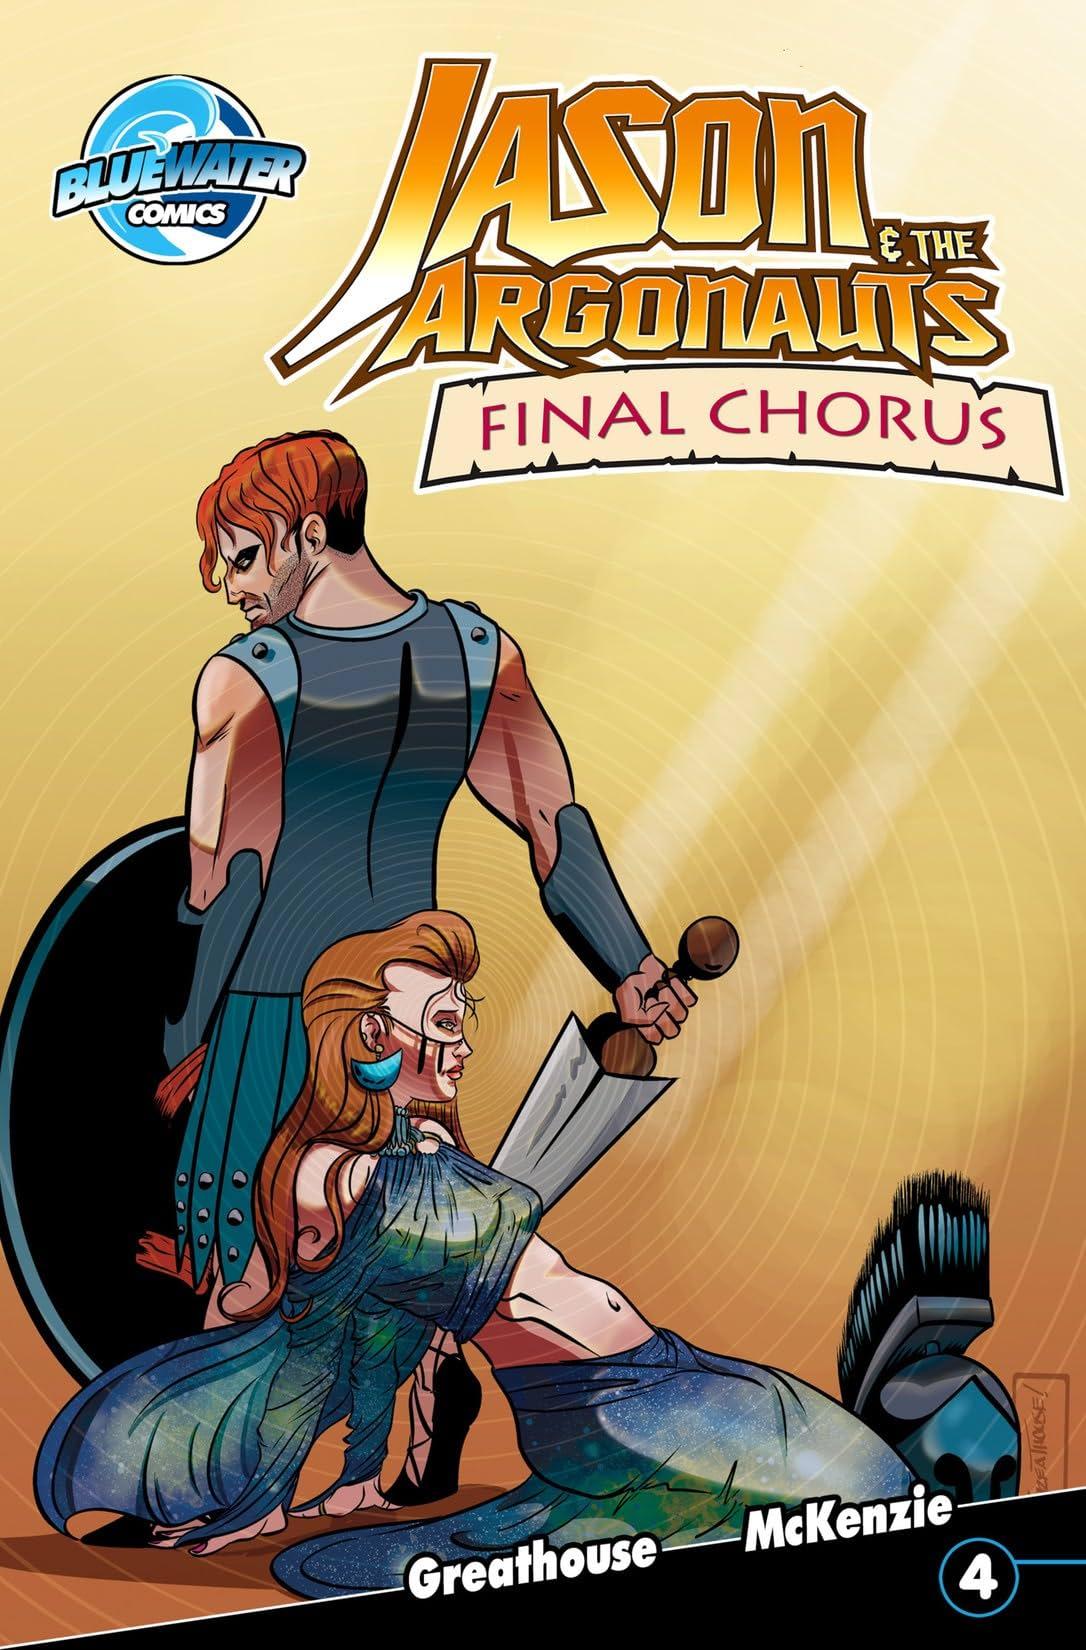 Jason and the Argonauts: Final Chorus #4